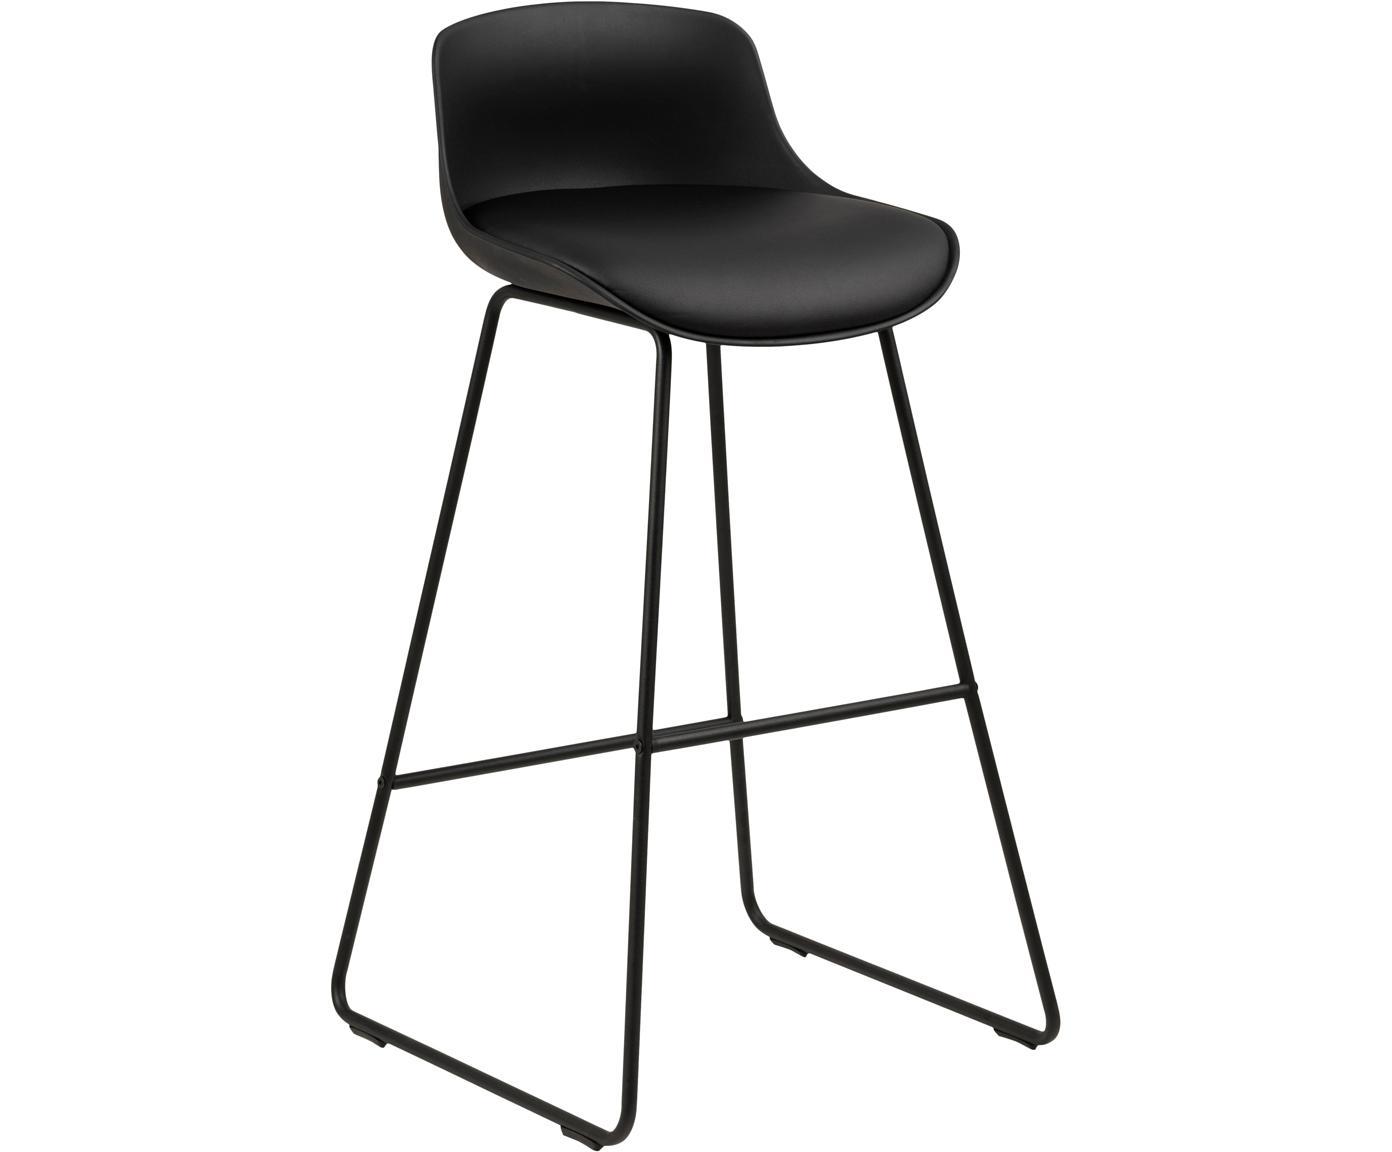 Sedia da bar in similpelle Tina 2 pz, Rivestimento: similpelle (poliuretano), Gambe: metallo verniciato a polv, Nero, Larg. 43 x Prof. 49 cm